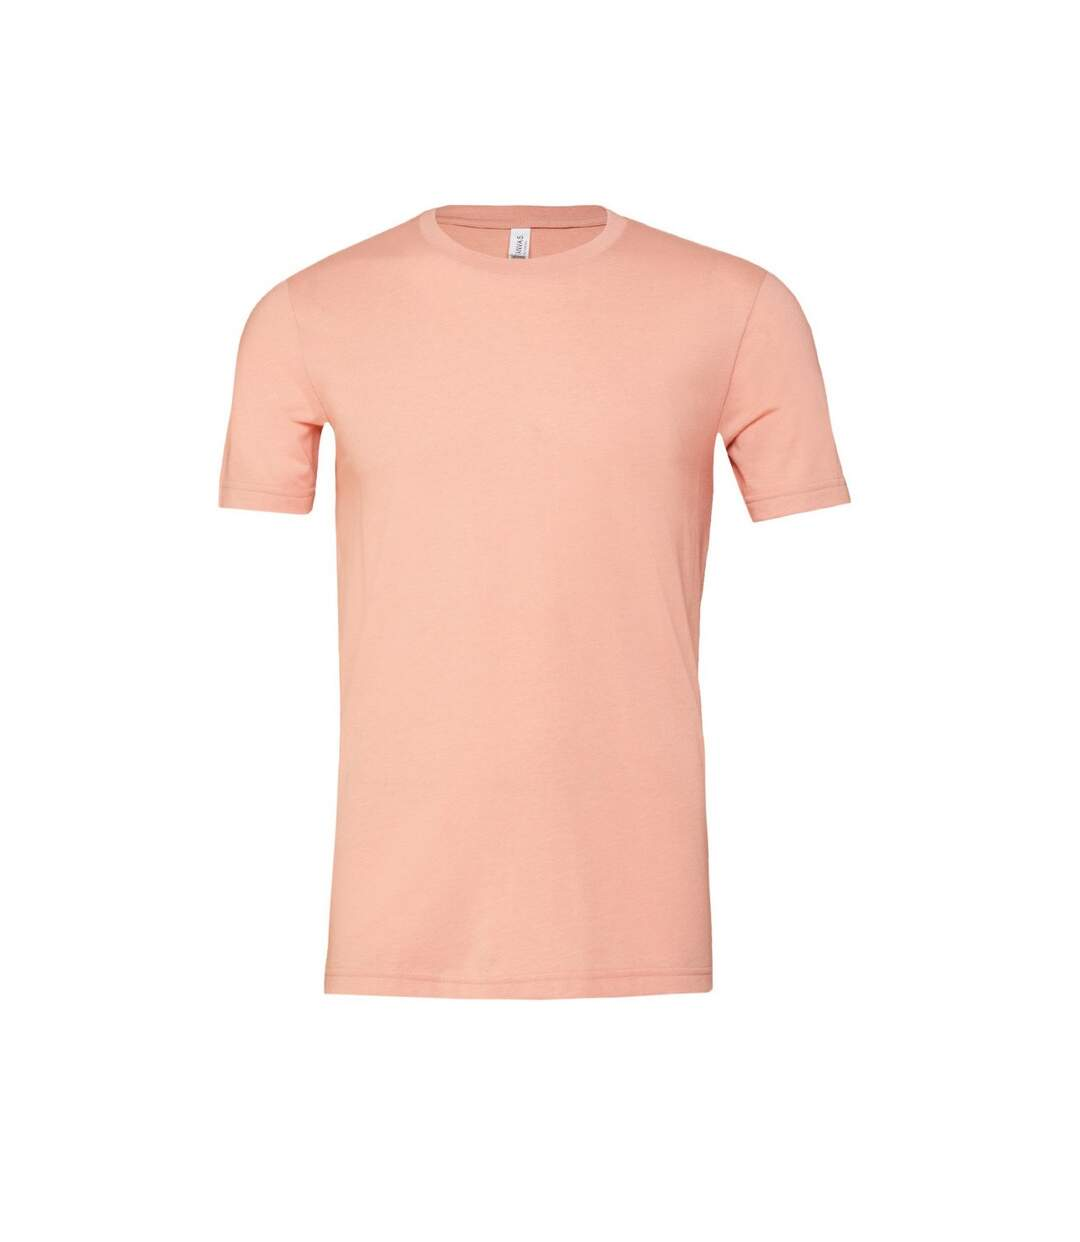 Canvas Unisex Jersey Crew Neck T-Shirt / Mens Short Sleeve T-Shirt (Heather Peach) - UTBC163